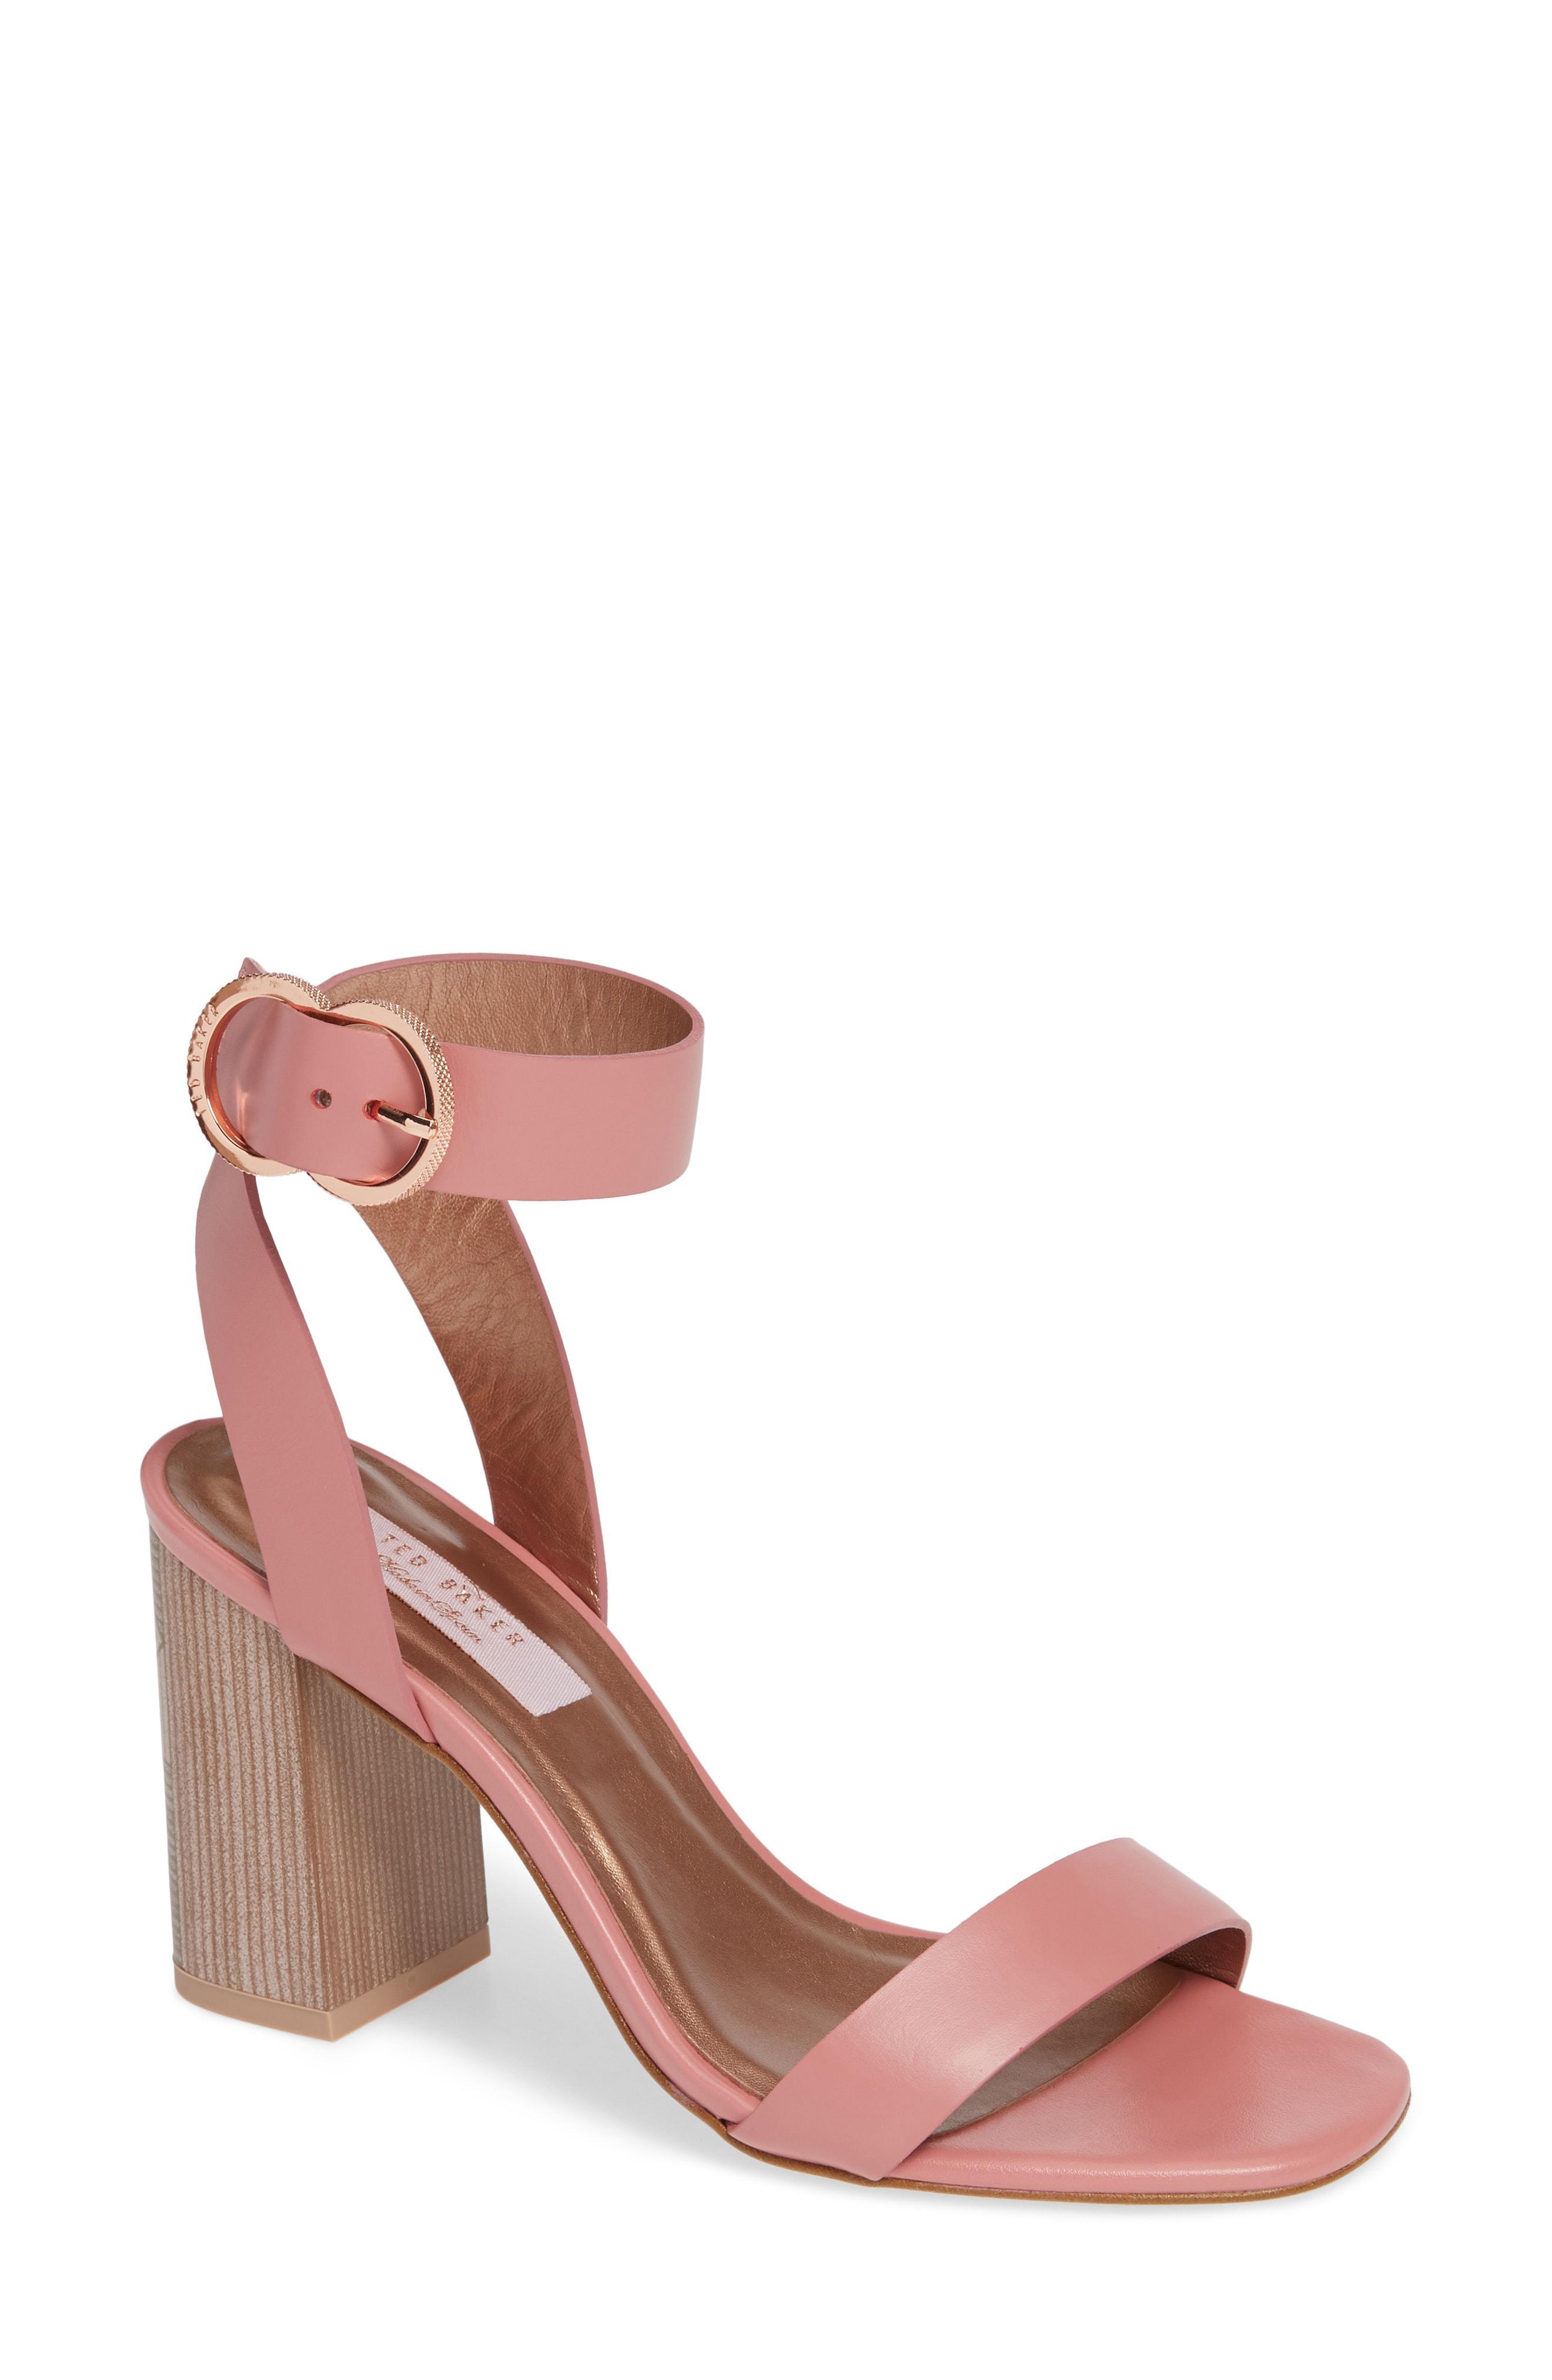 fffd189f7 Lyst - Ted Baker Vallama Block Heel Sandal